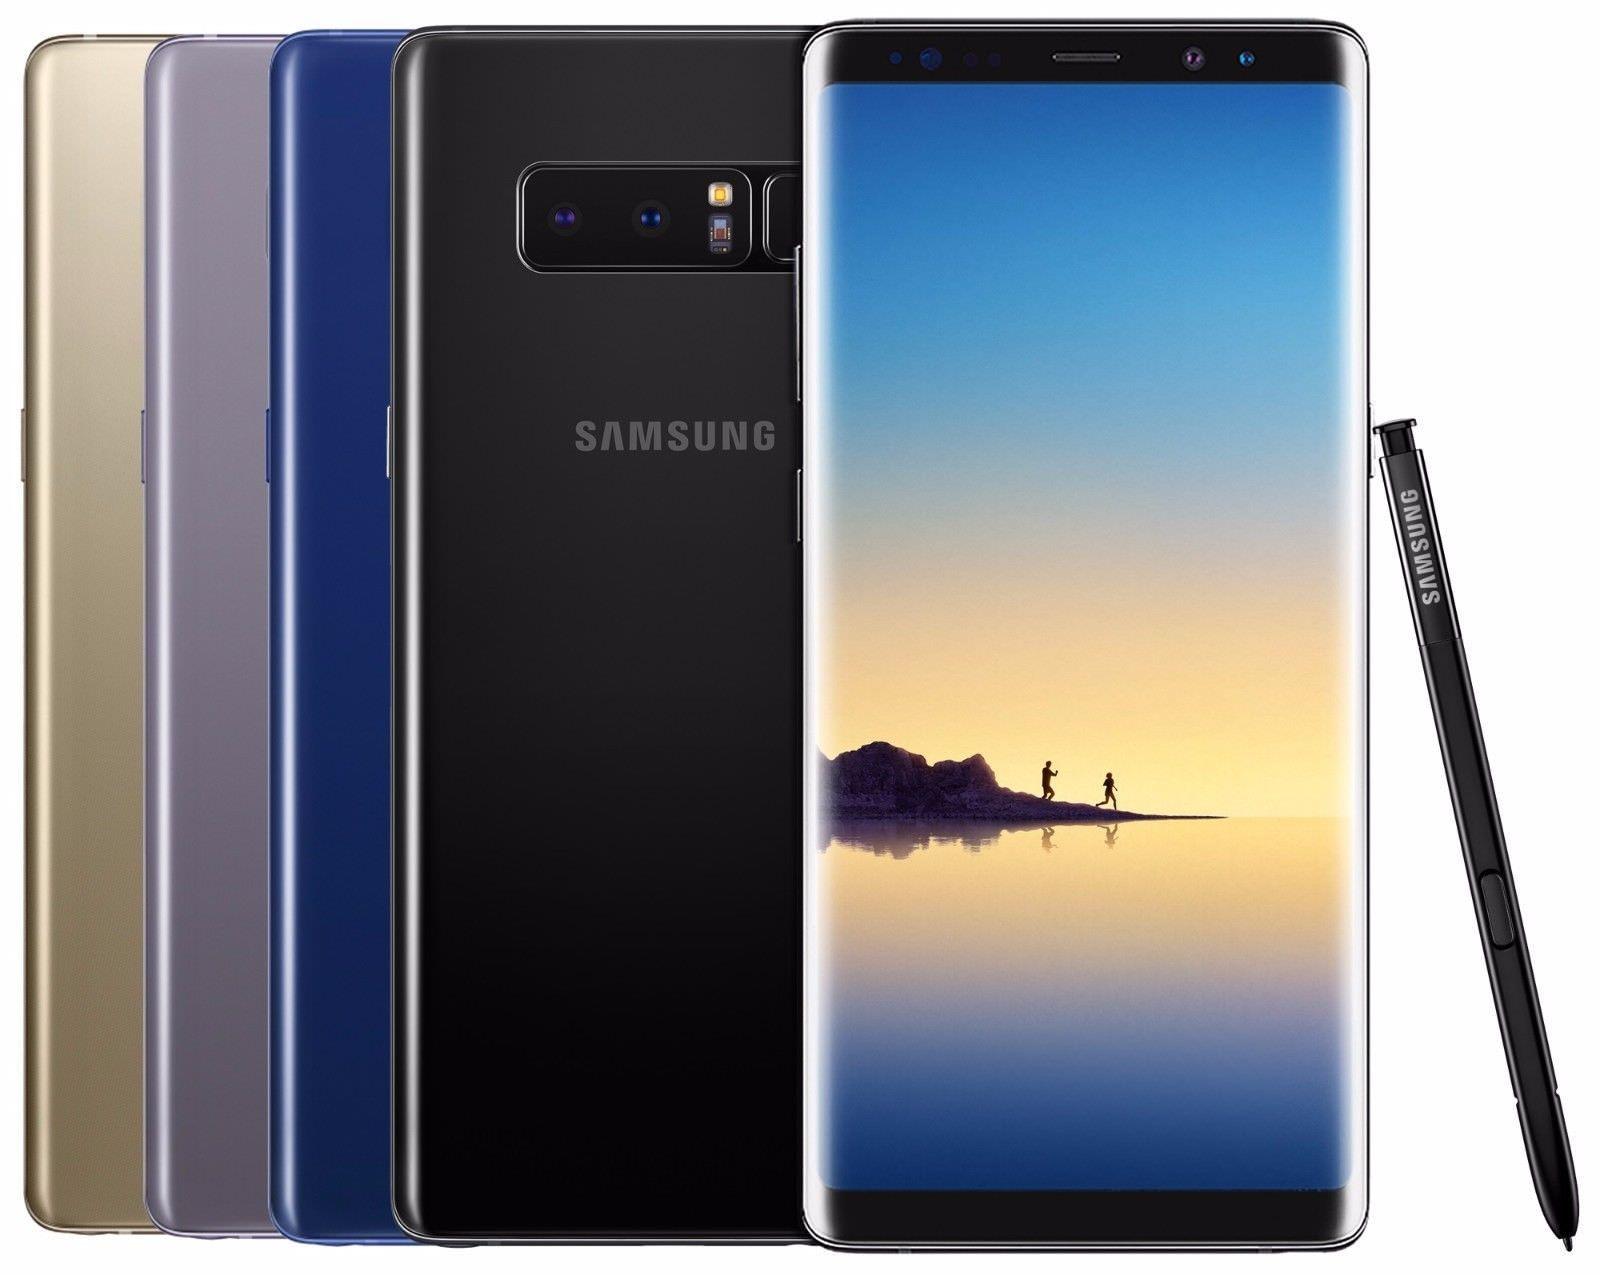 More Than 35 Off Samsung Galaxy Note 8 64 Gb Samsung Galaxy Samsung Galaxy Note 8 Samsung Phone